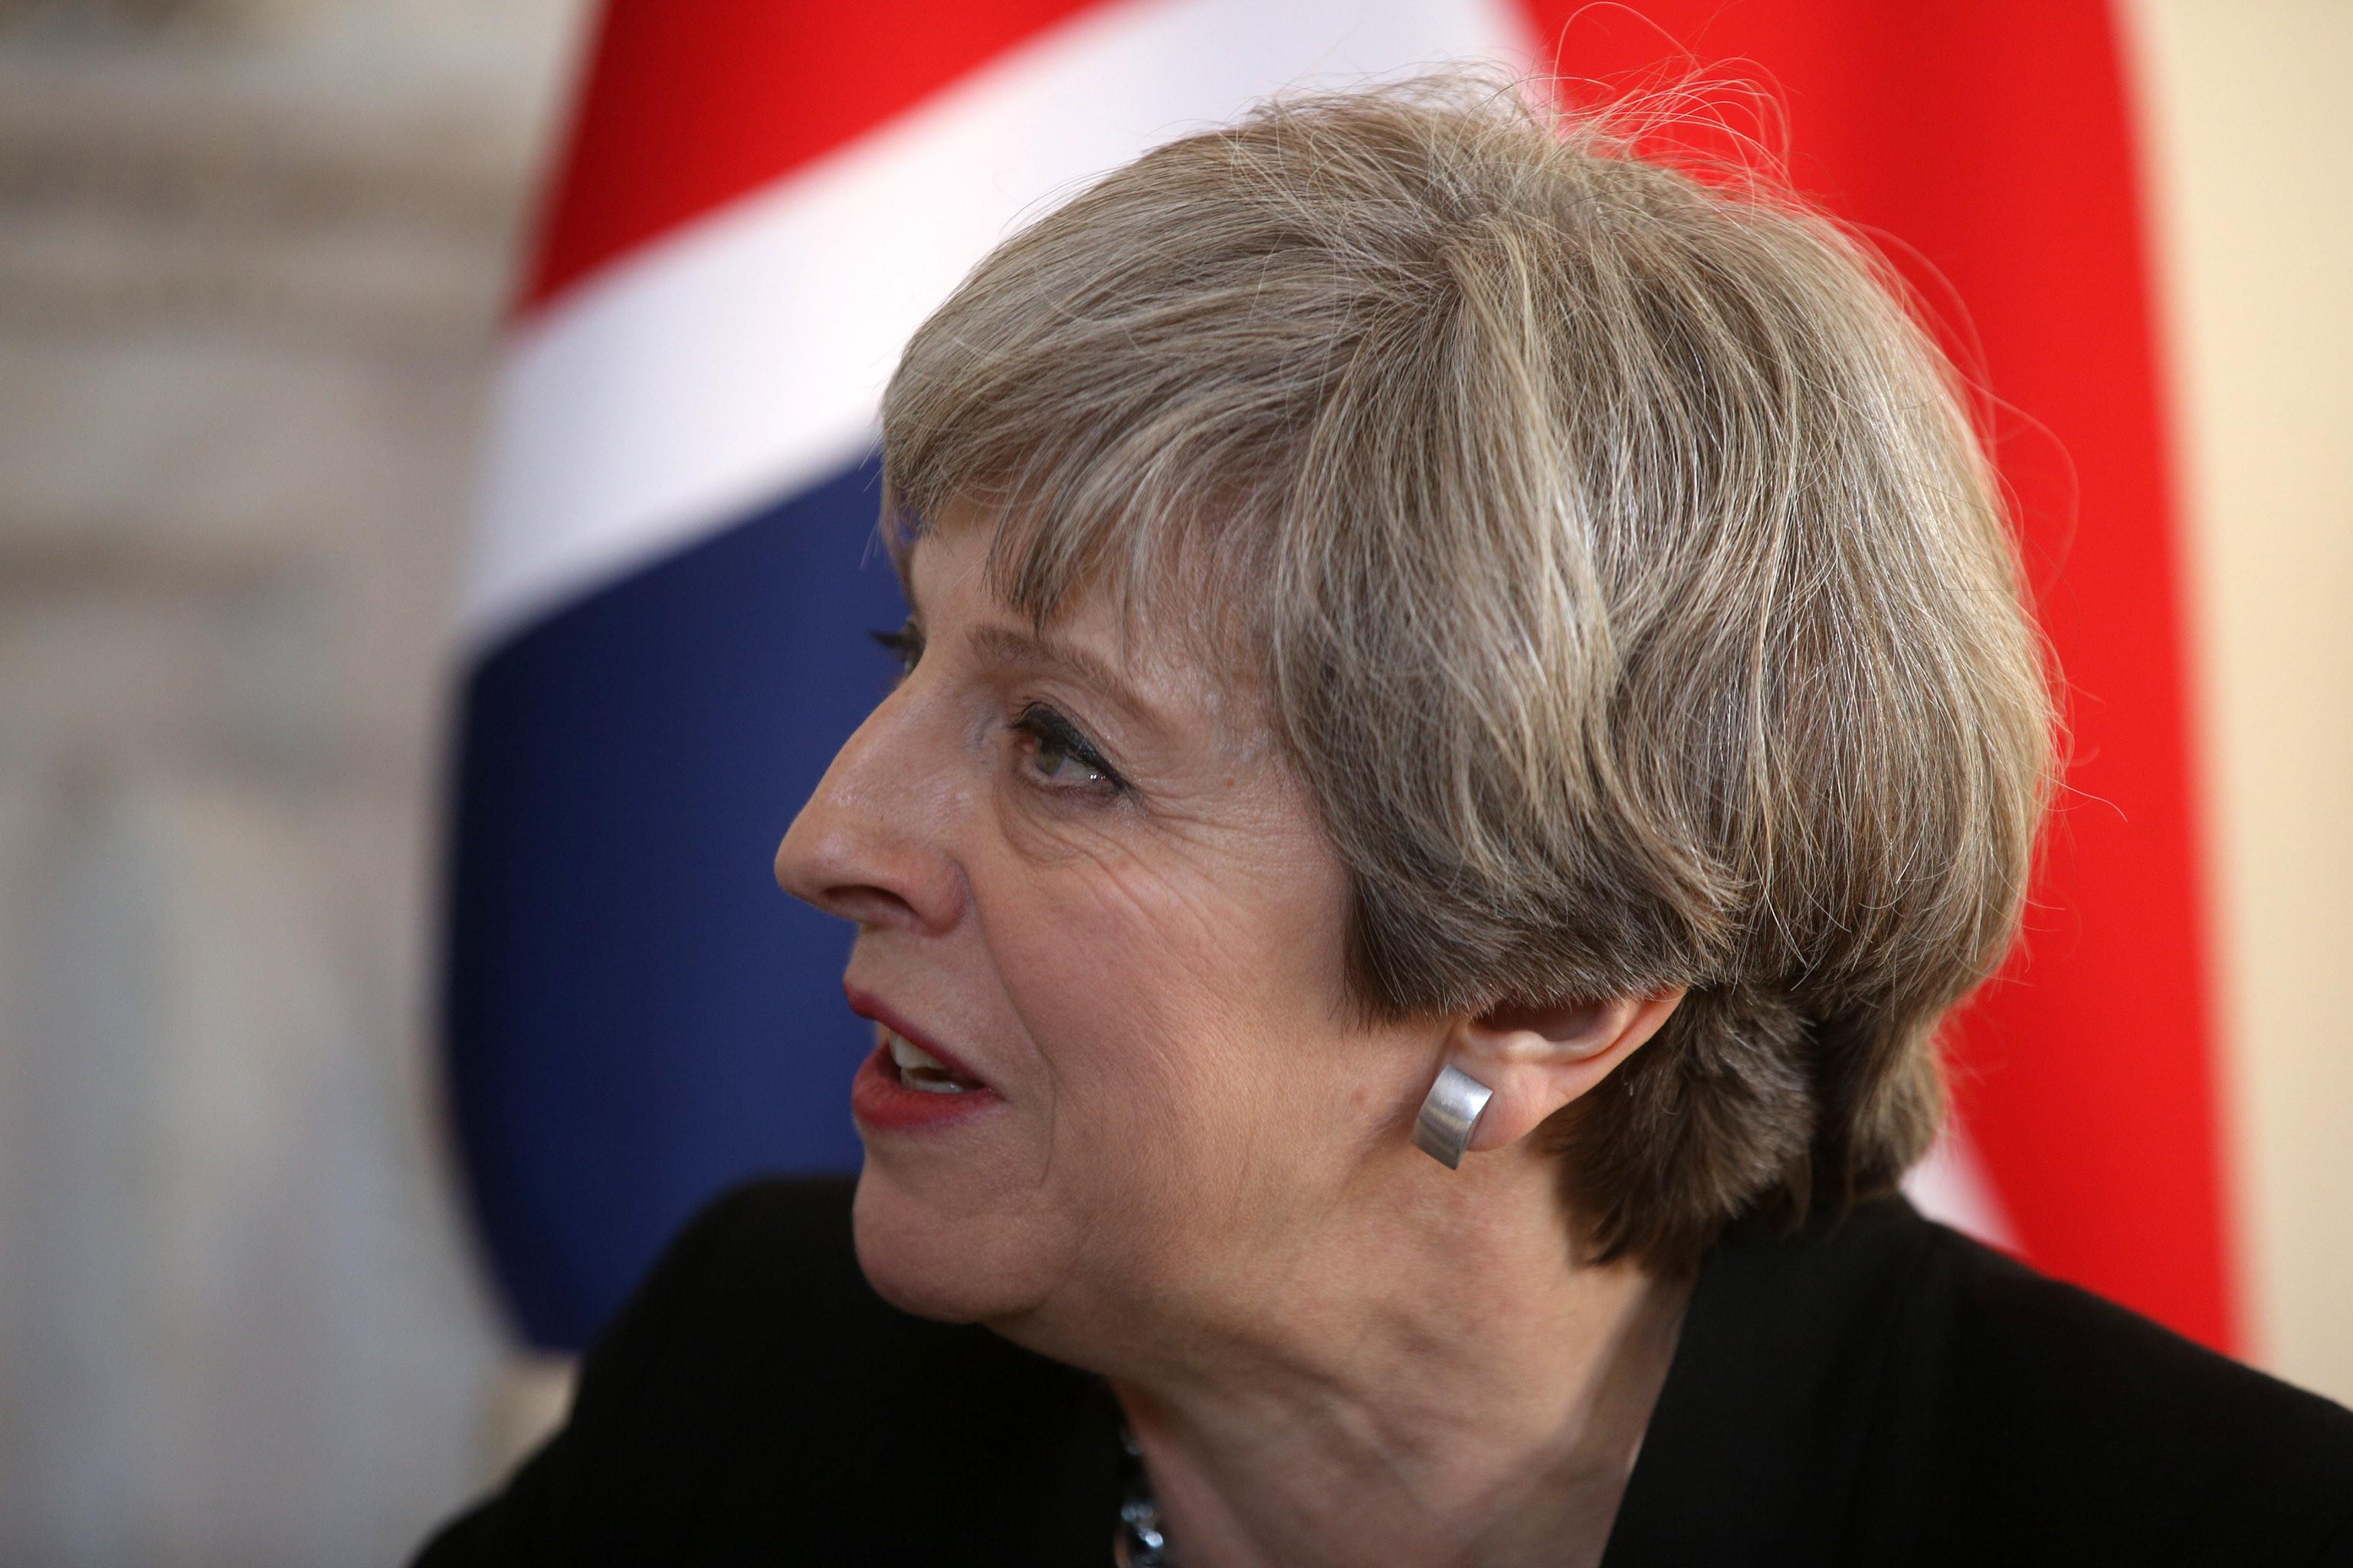 <p>Премьер-министр Великобритании Тереза Мэй. Фото:<span>&copy; РИА Новости/ Михаил Палинчак</span></p>